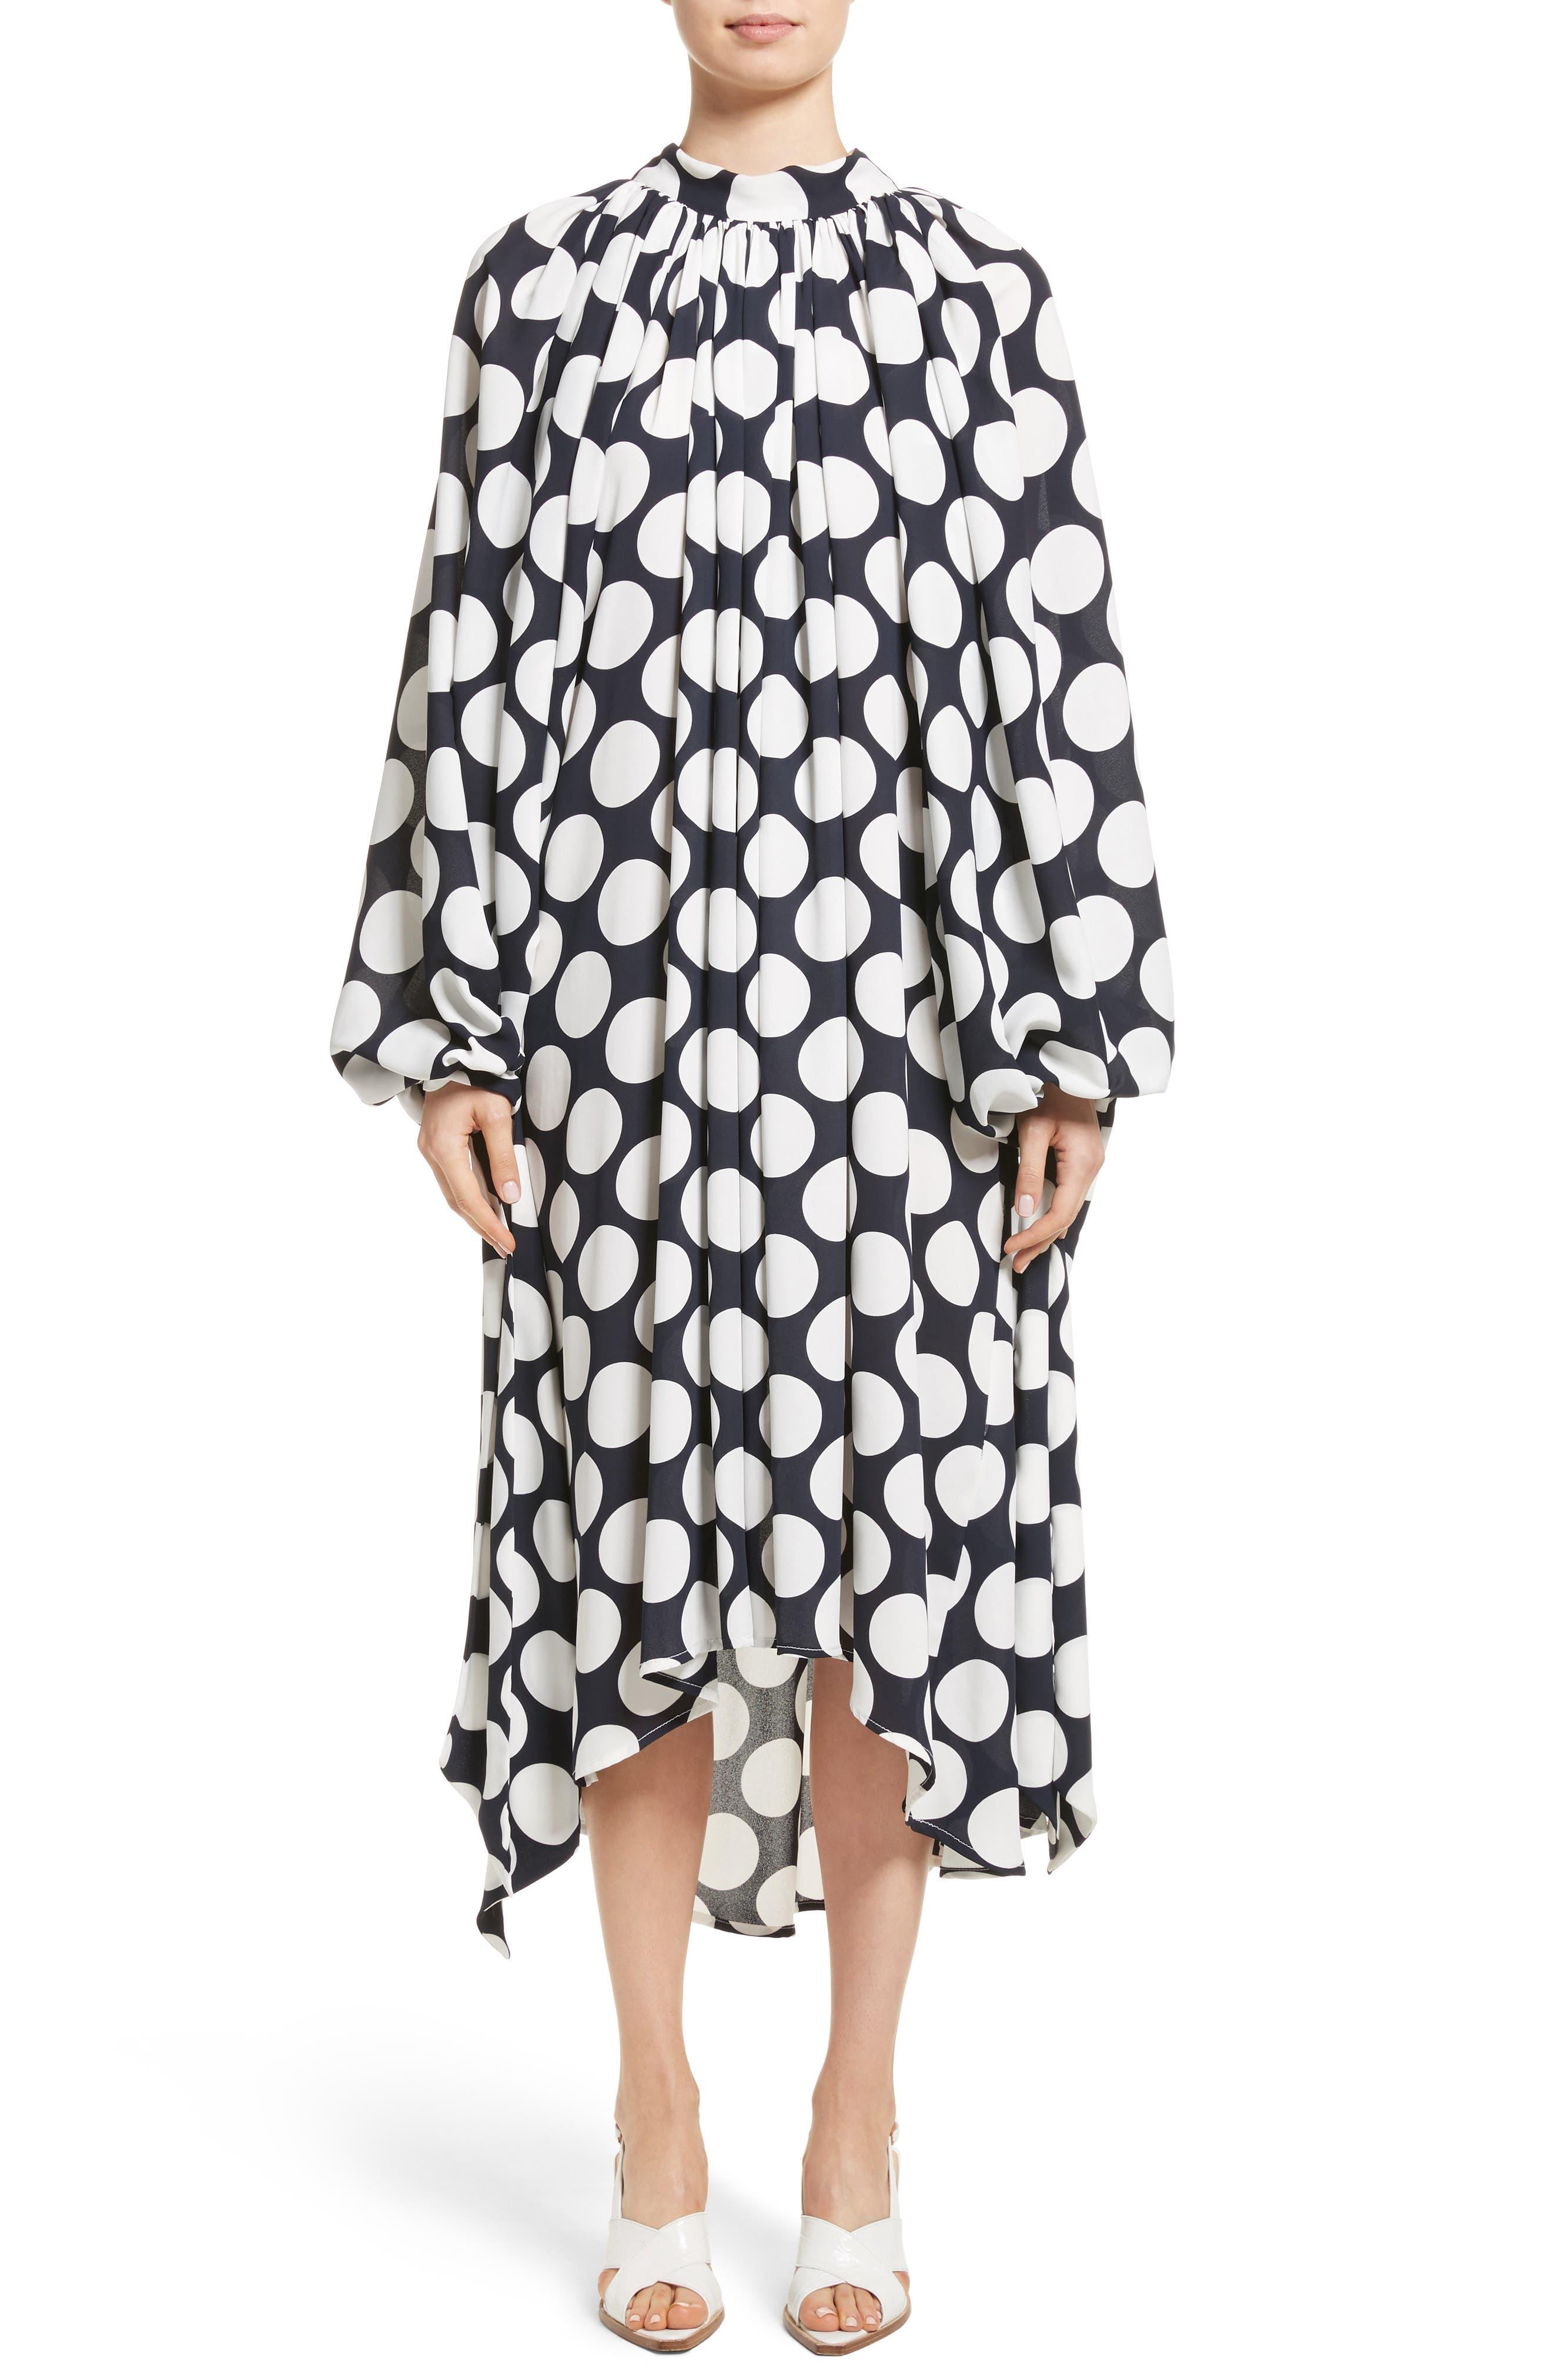 A.W.A.K.E. Giant Polka Dot Gathered Collar Dress